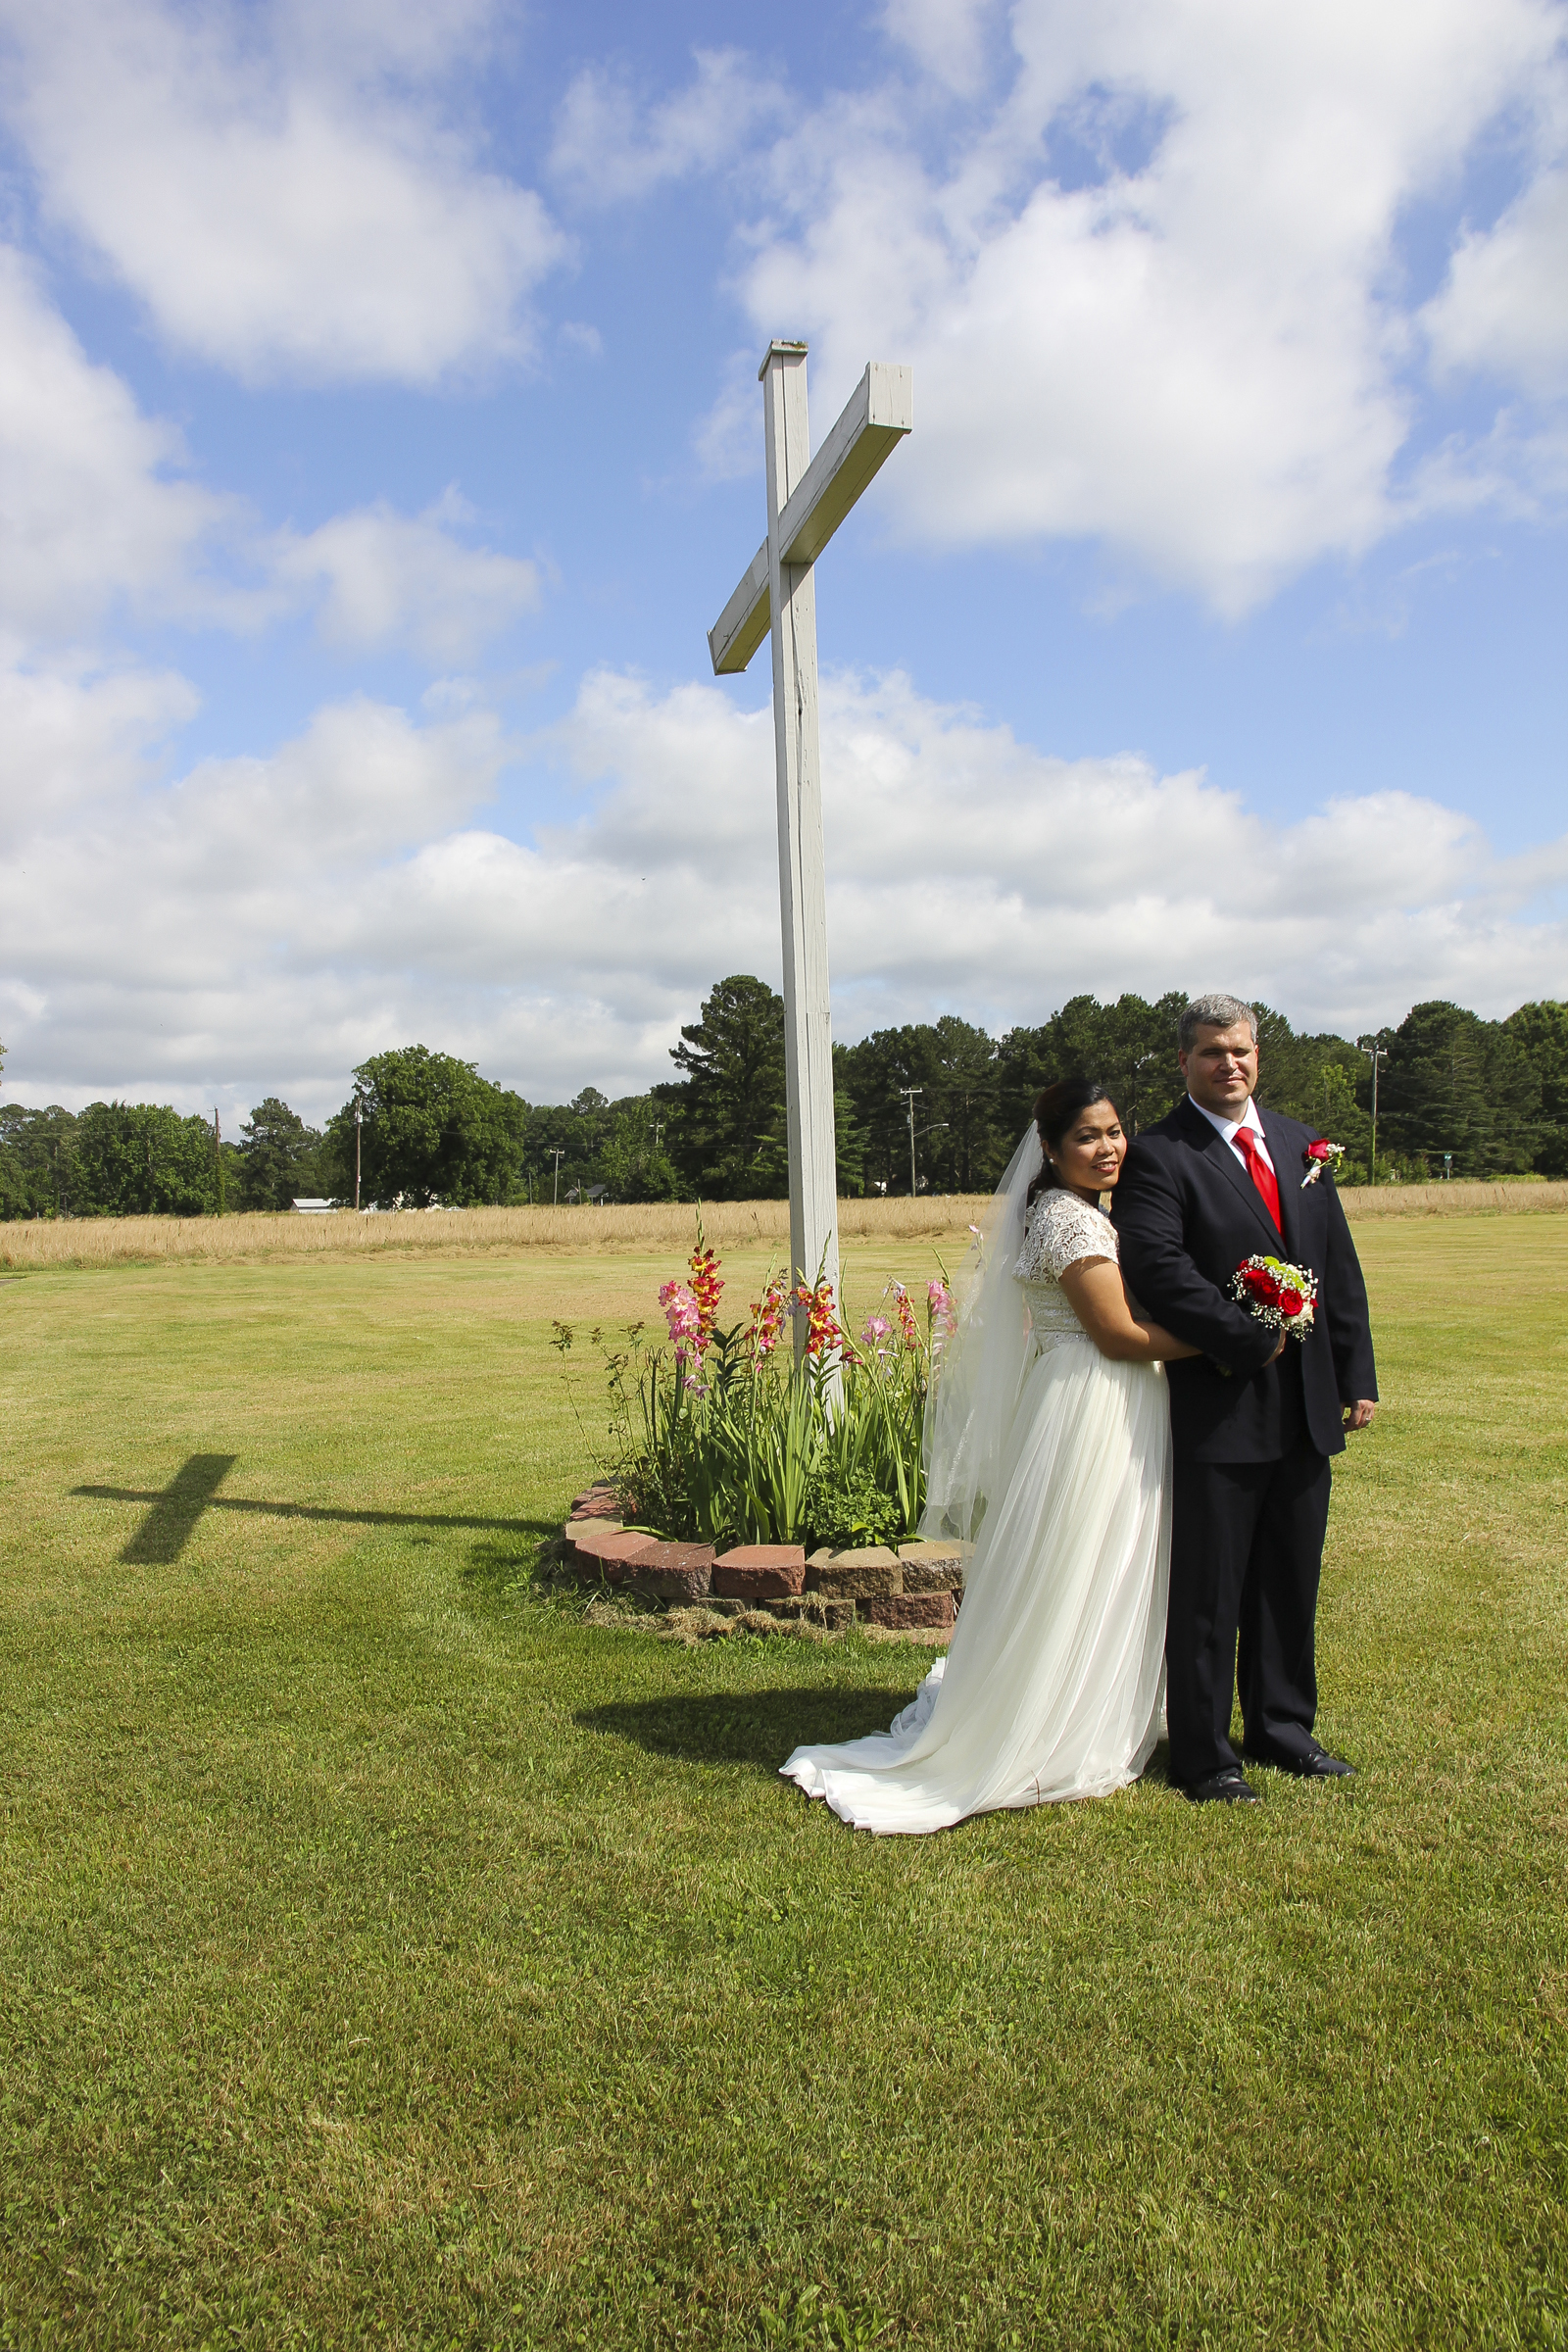 062516_Wedding_Toby-0141.jpg